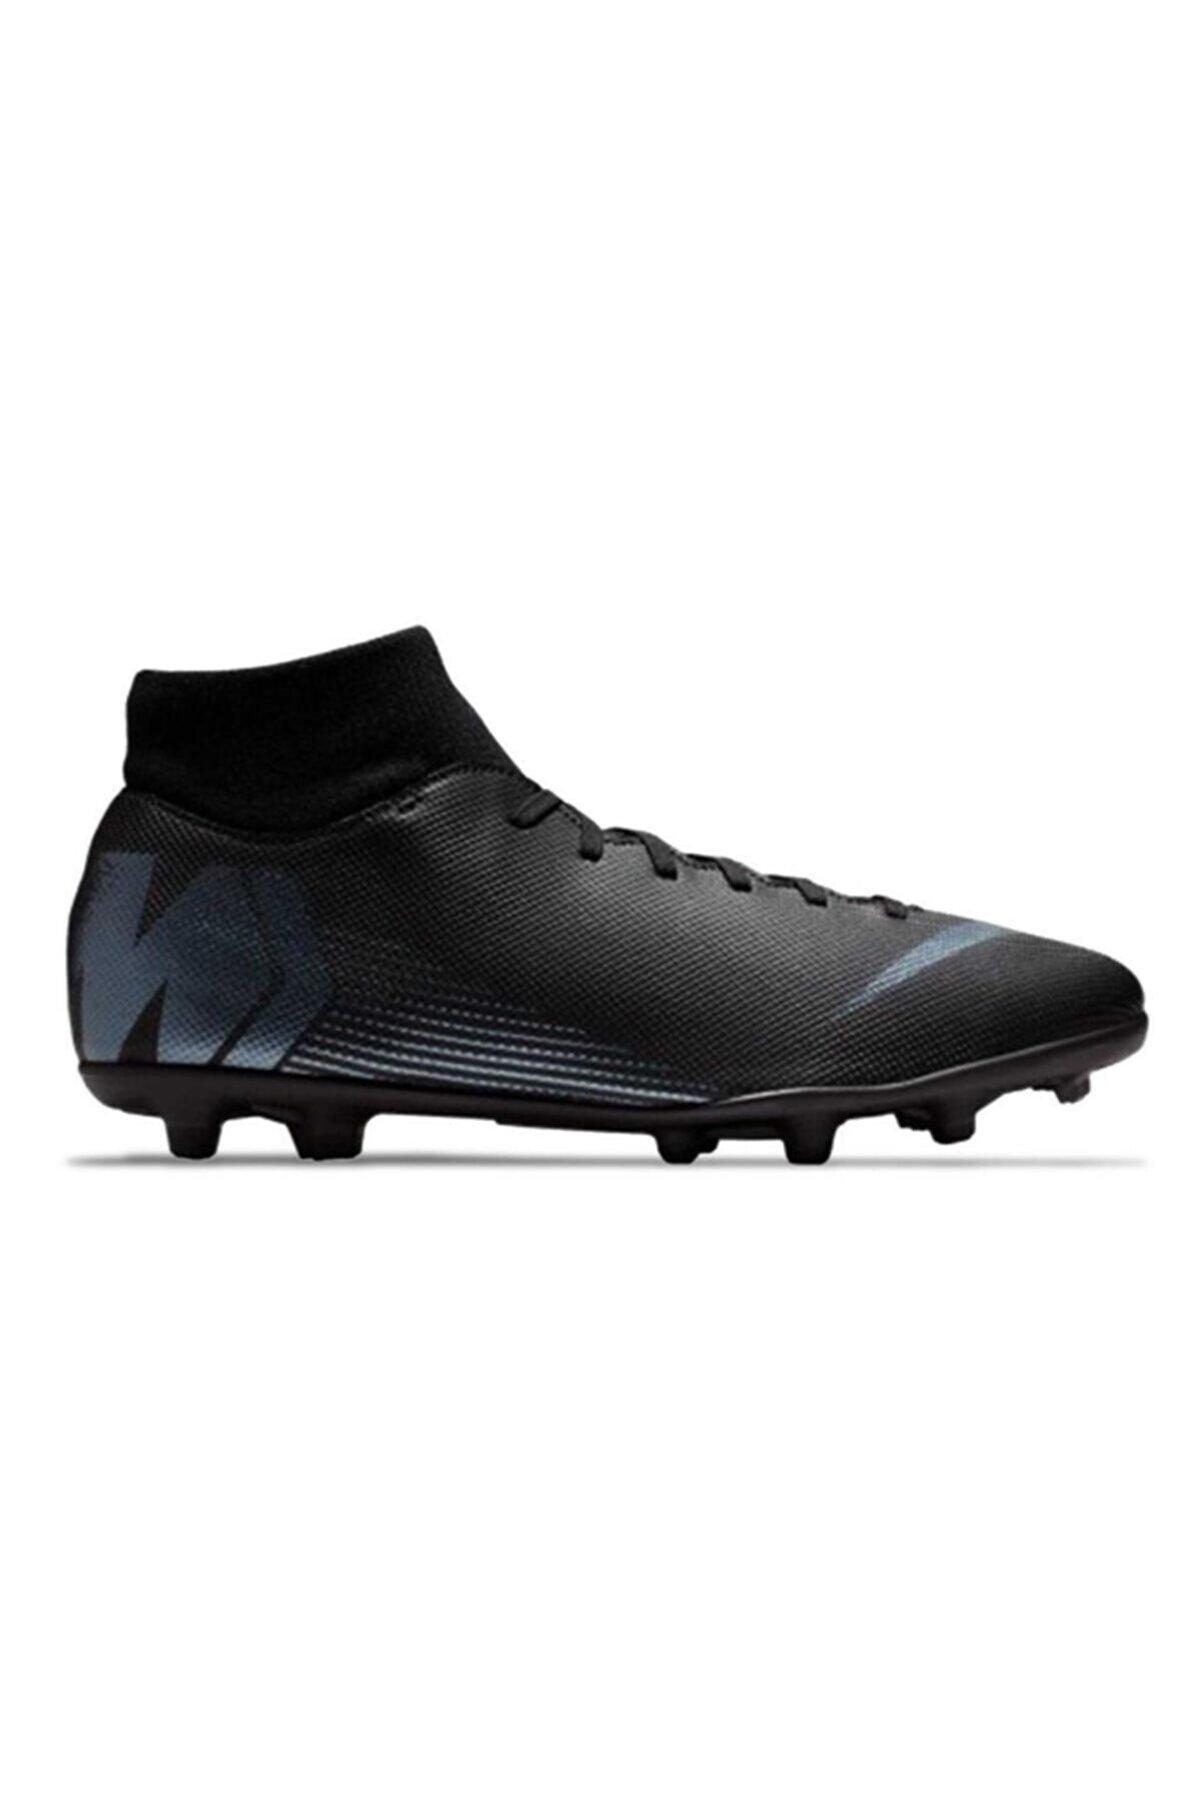 Nike Ah7363-001 Mercurial Superfly Vı Club 'raised On Concrete' Unisex Futbol Ayakkabı